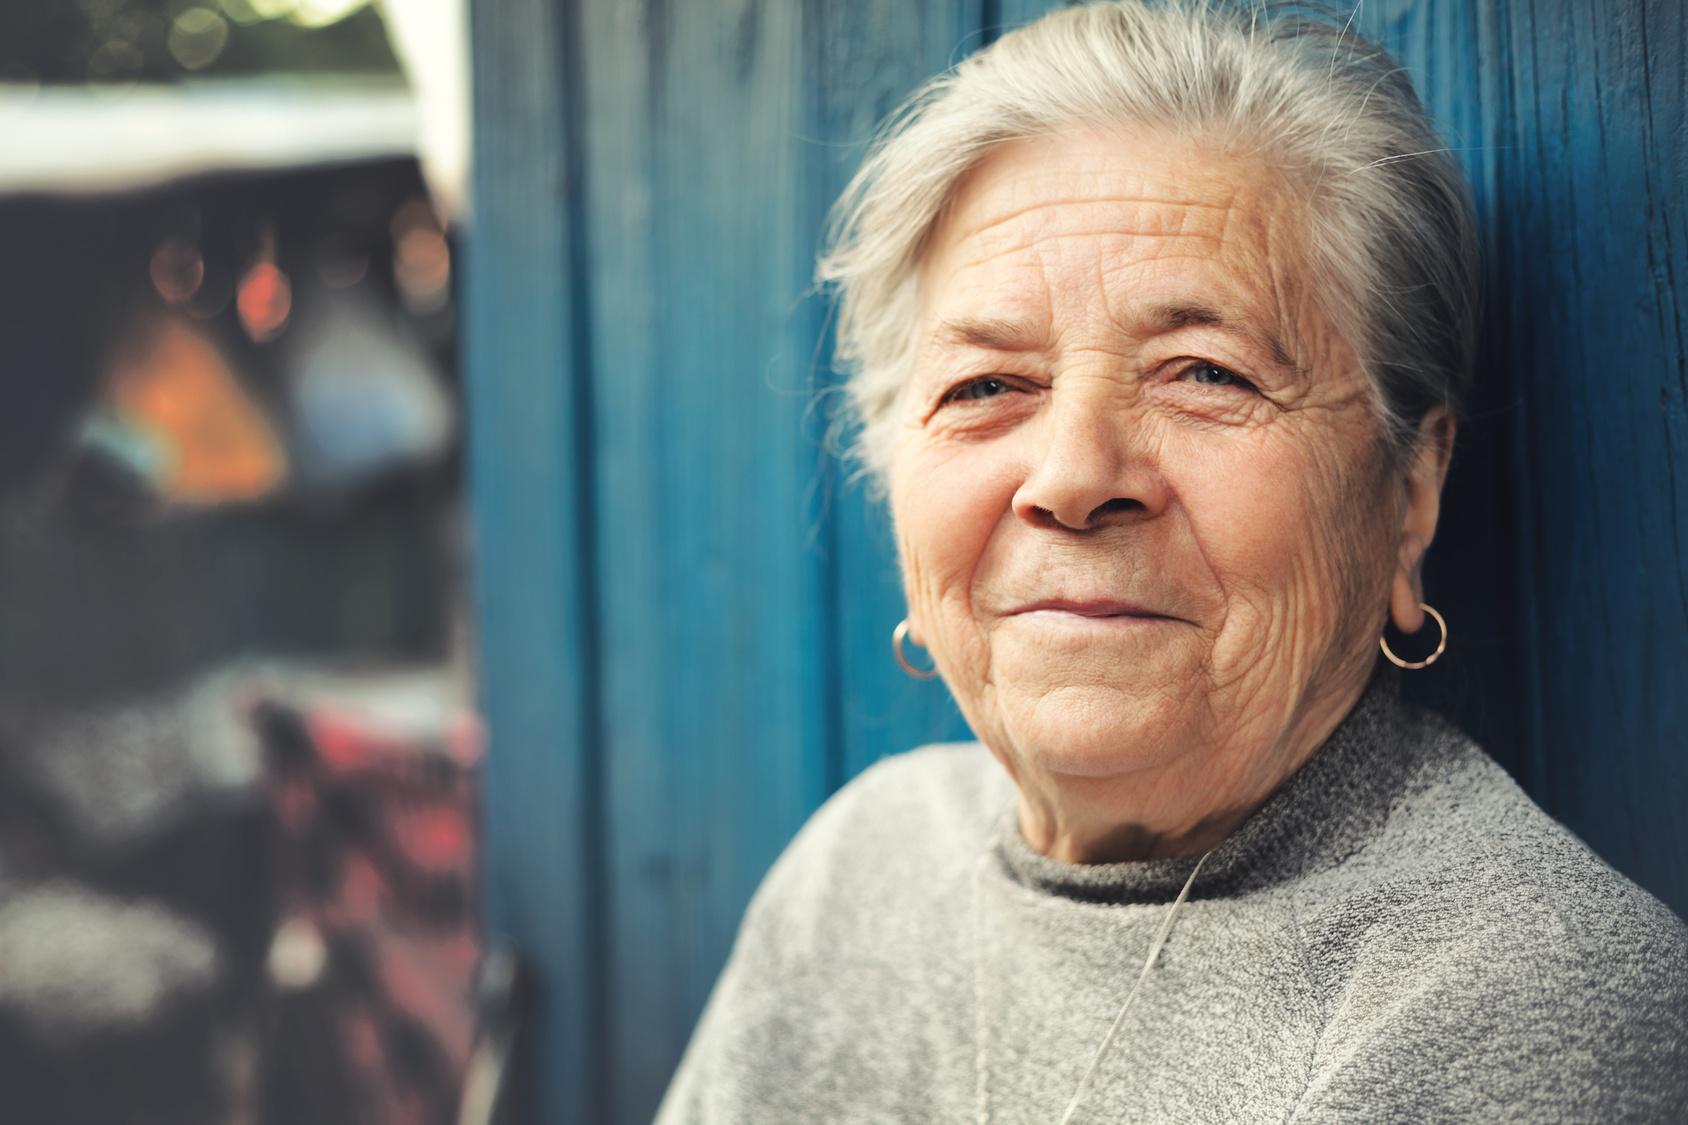 Ältere Hartz-IV-Empfänger sollen geschont werden